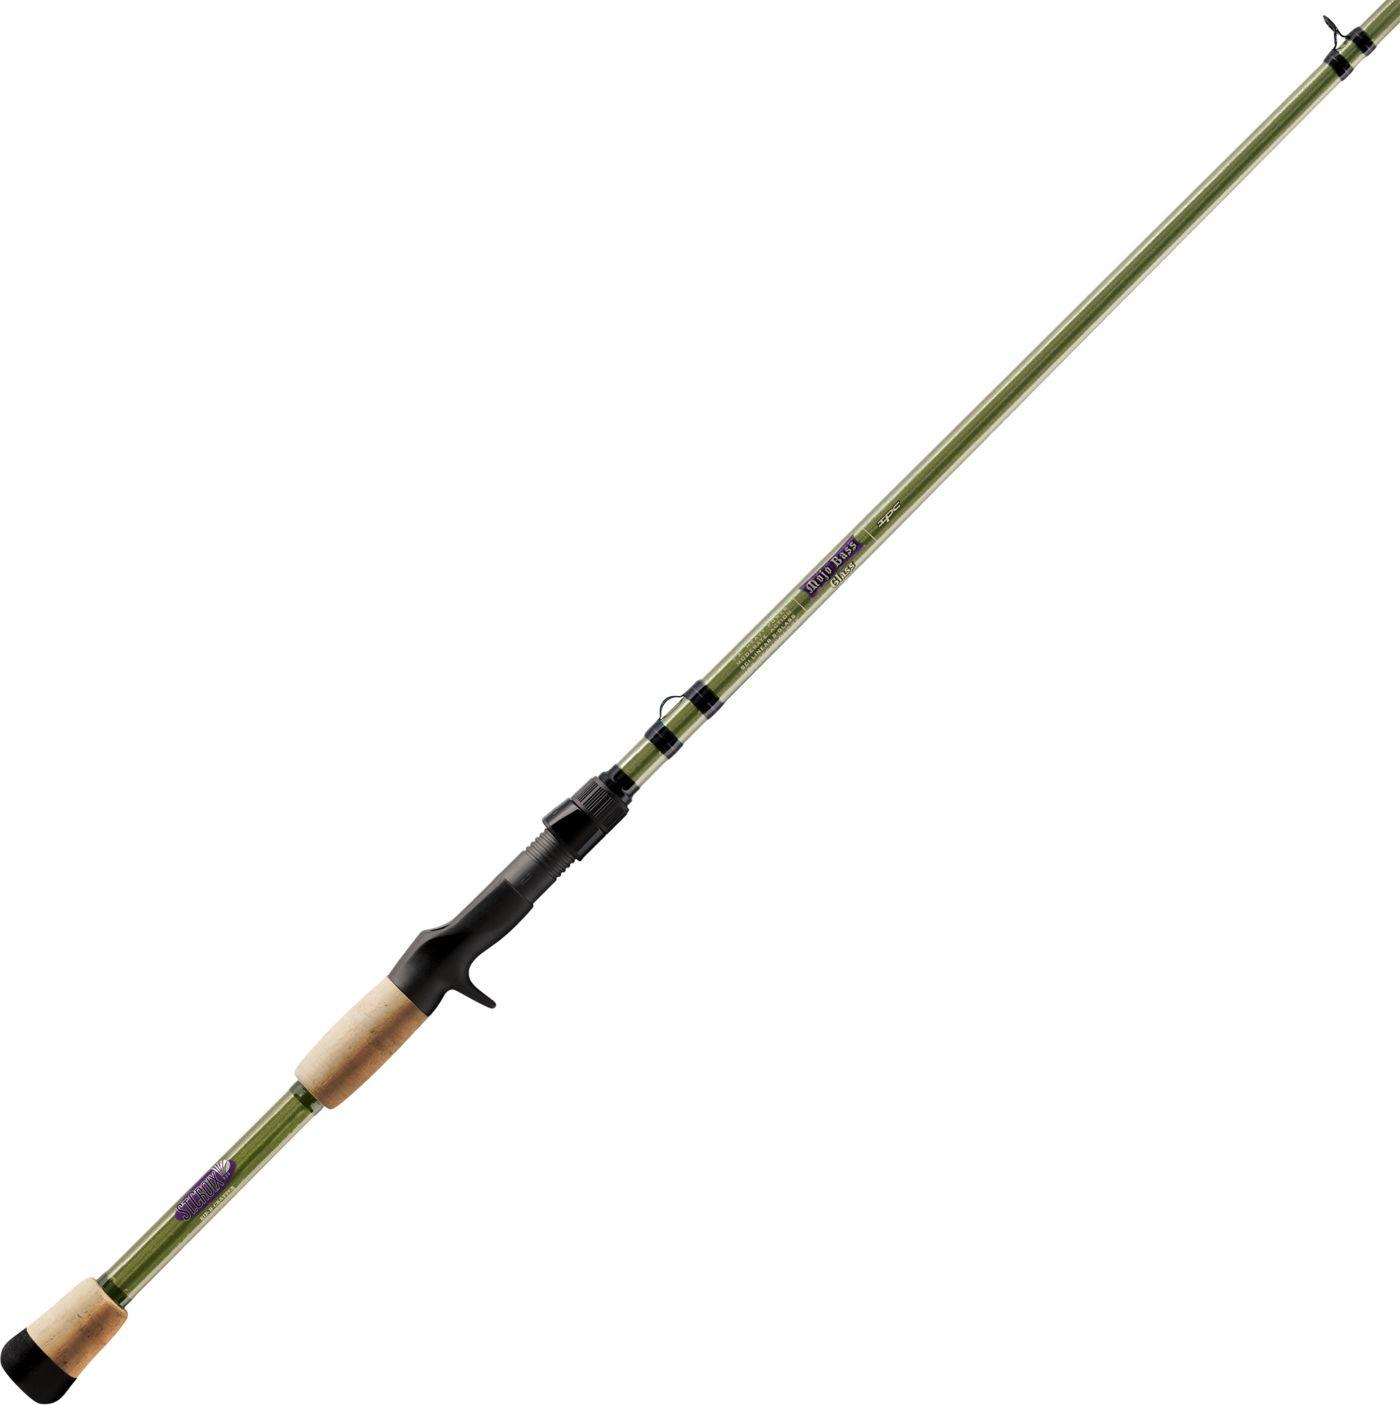 St. Croix Mojo Bass Glass Casting Rod